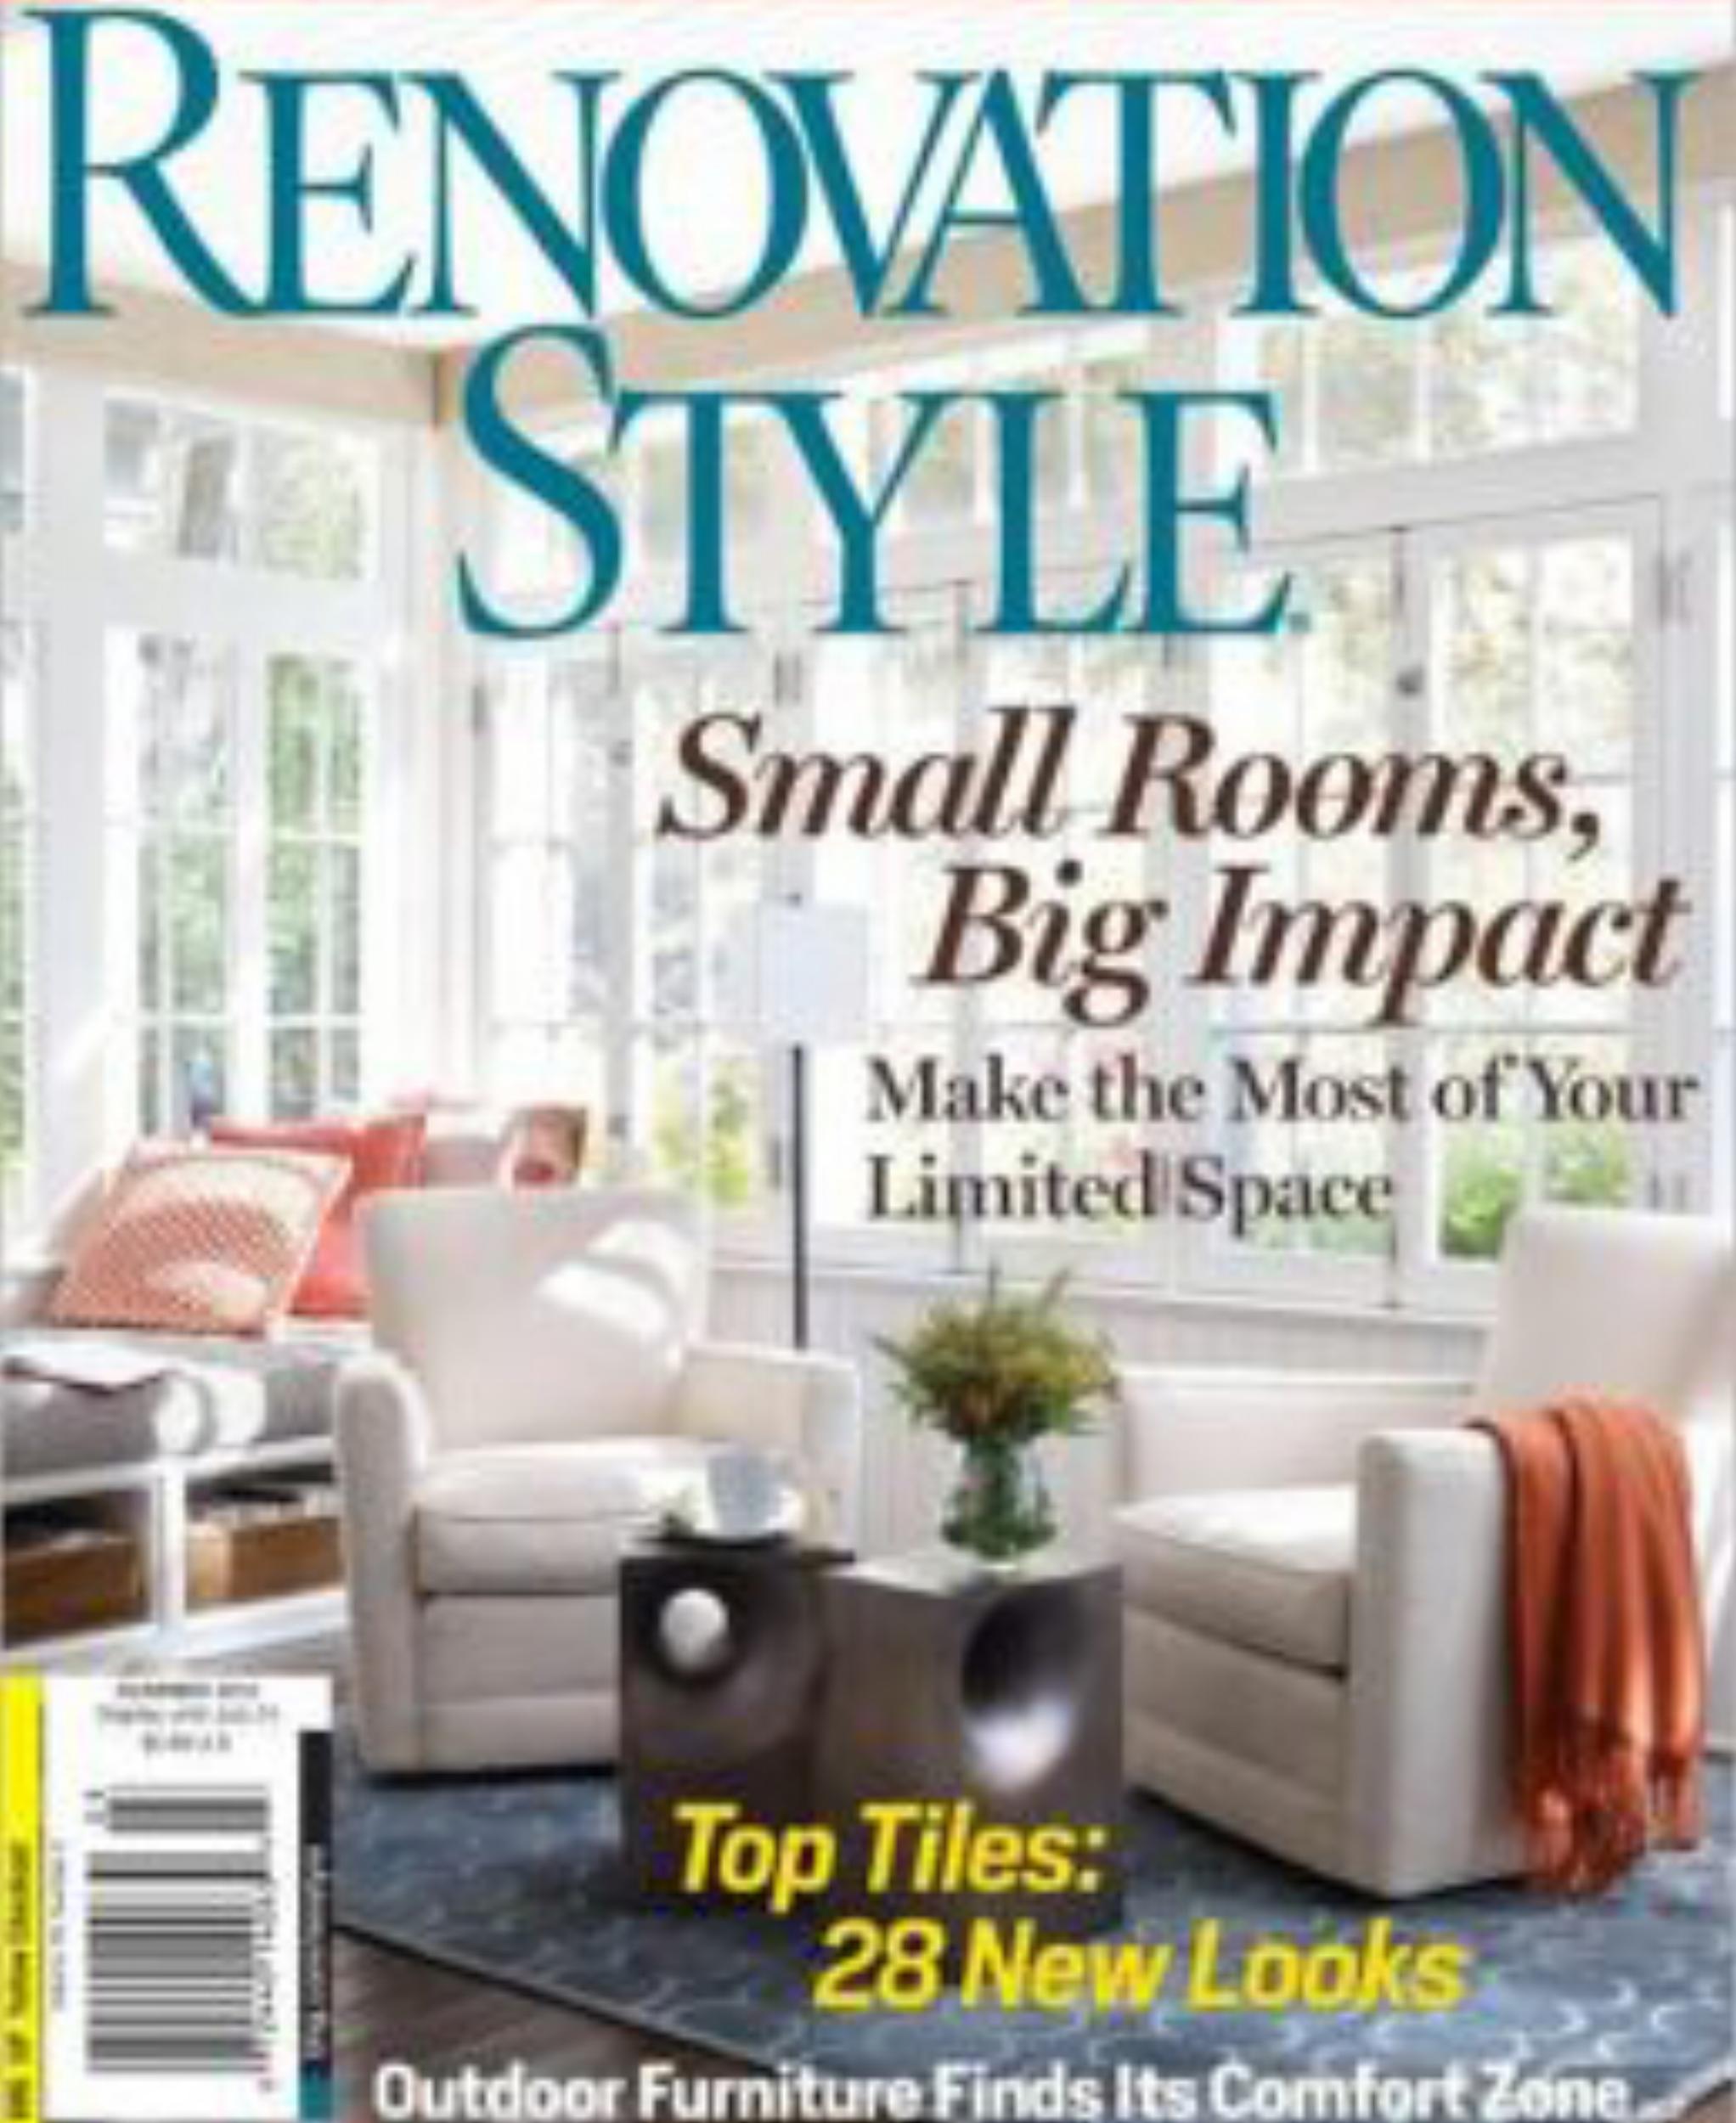 renovation style summer 2012 cover.jpg